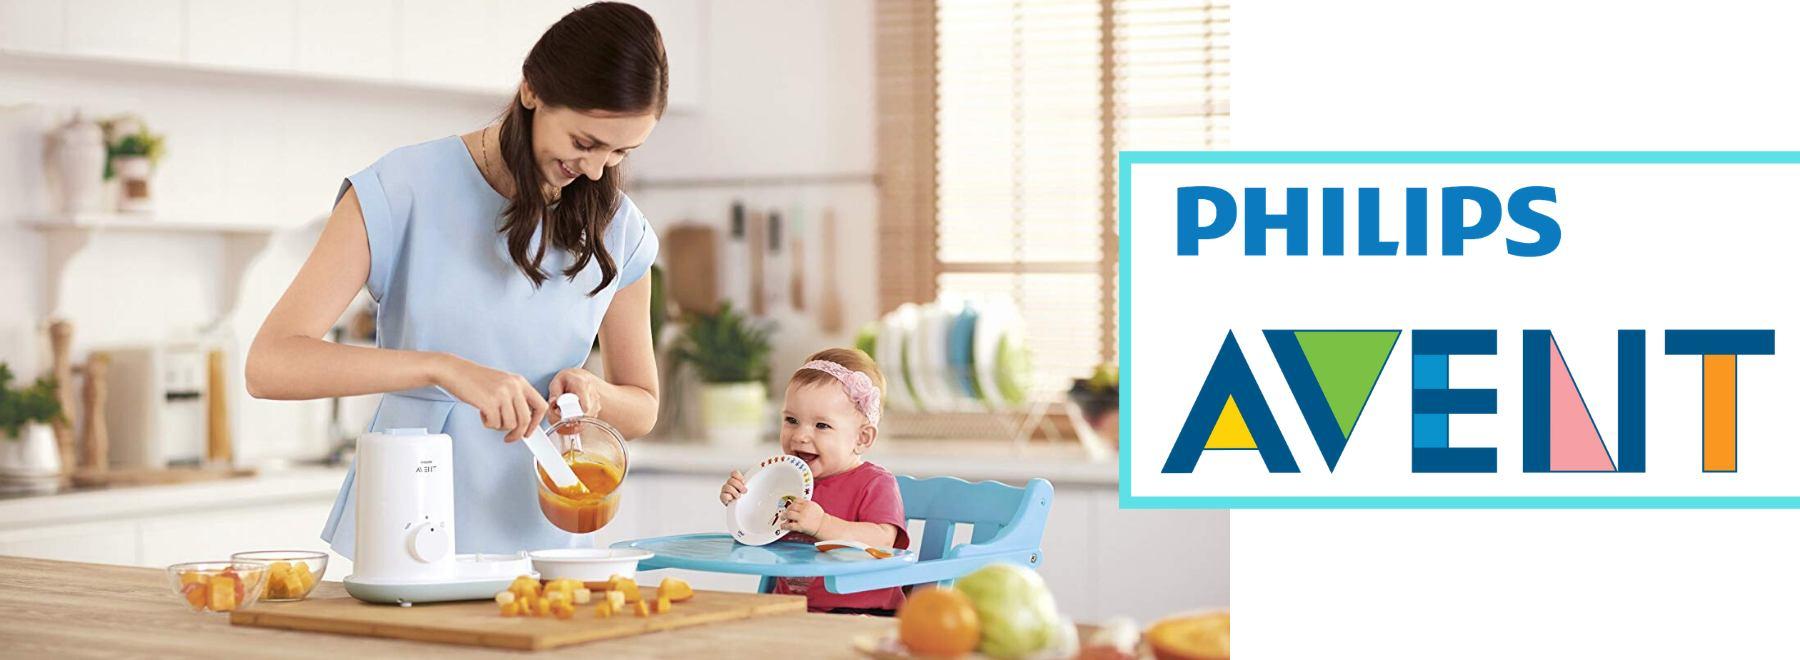 Philips Avent en Forsam parafarmacia